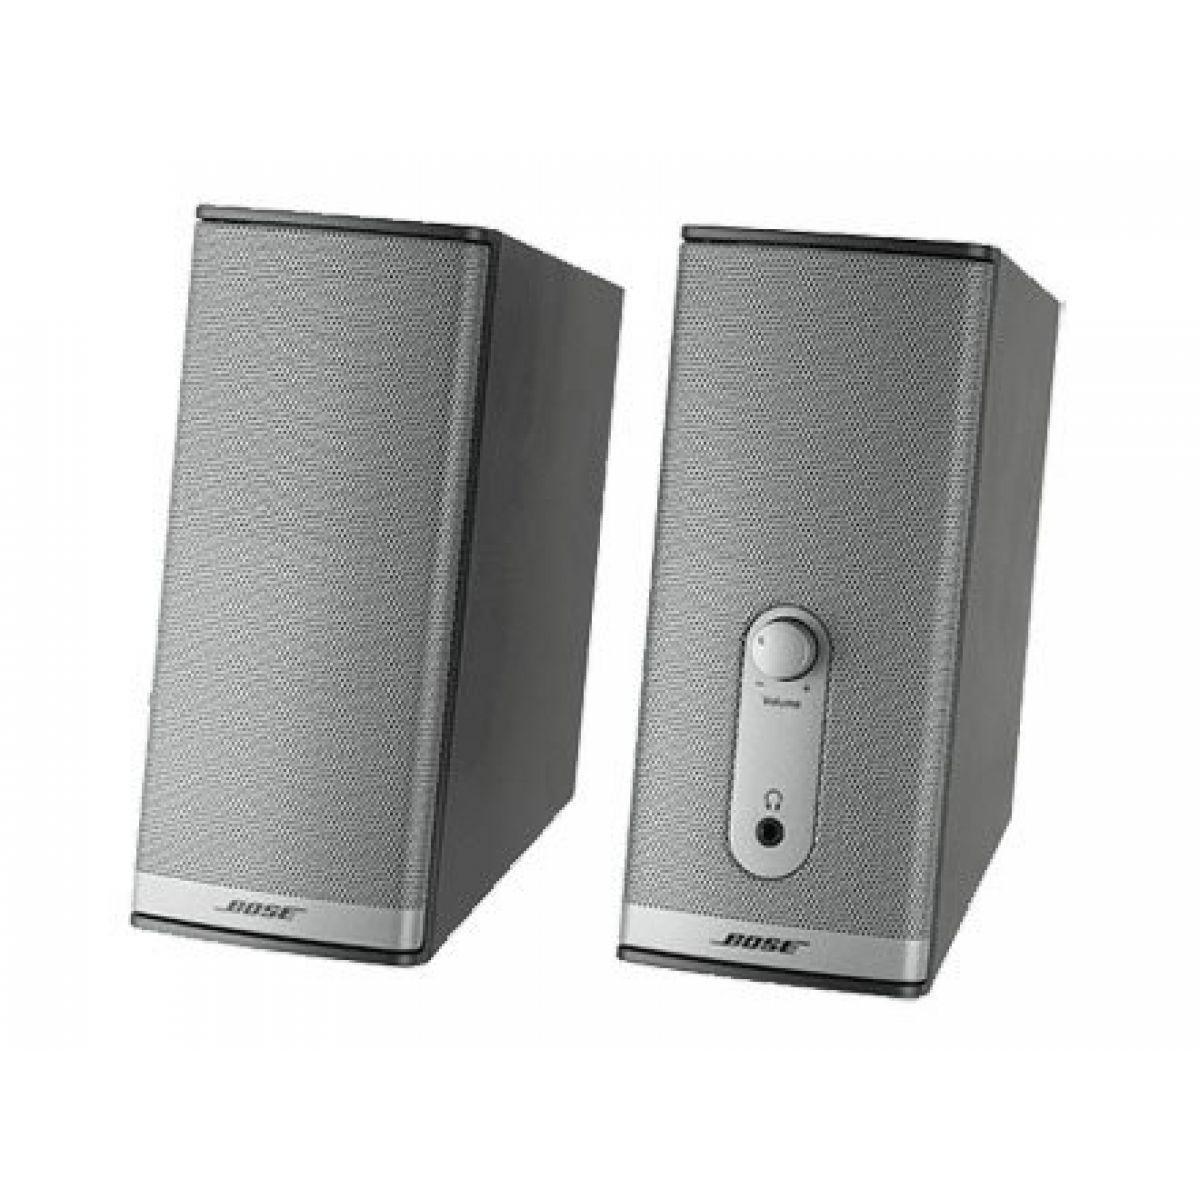 Enceinte Bose Companion 2 Series II - Gris